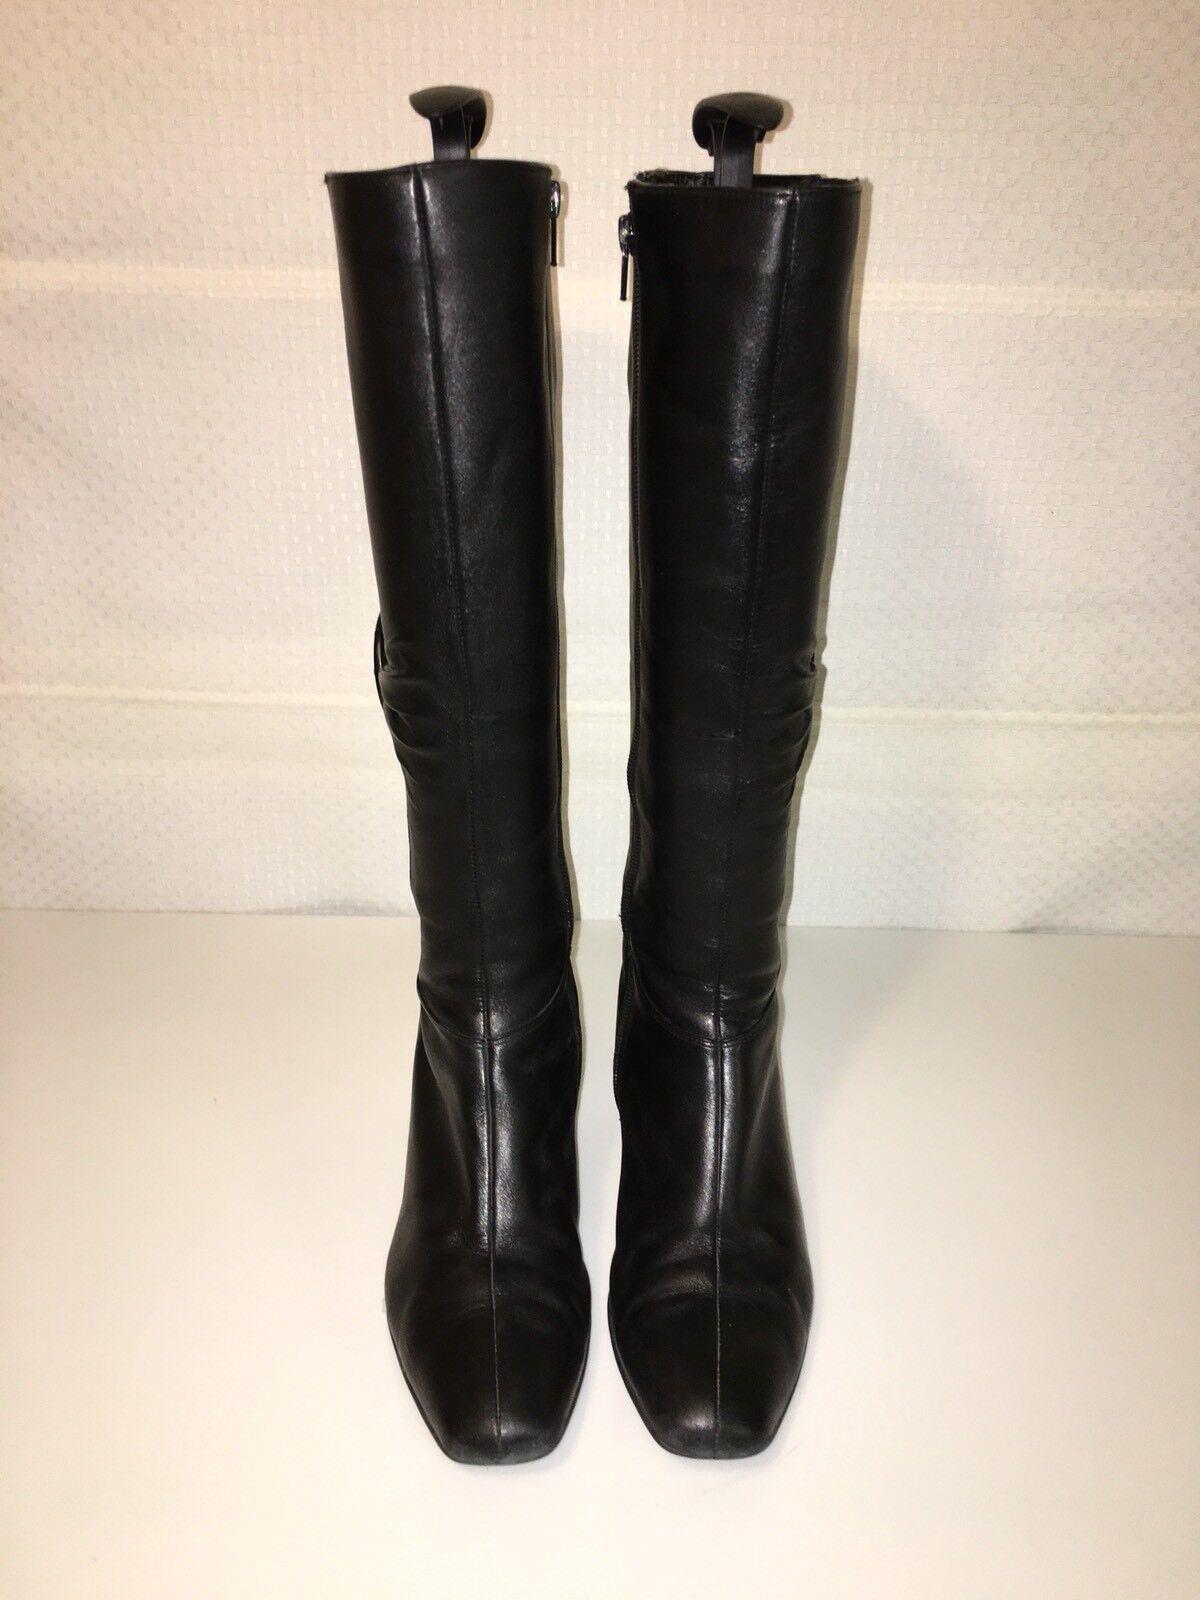 Clarks Woman's Long Stiefel Schuhes UK Größe 5